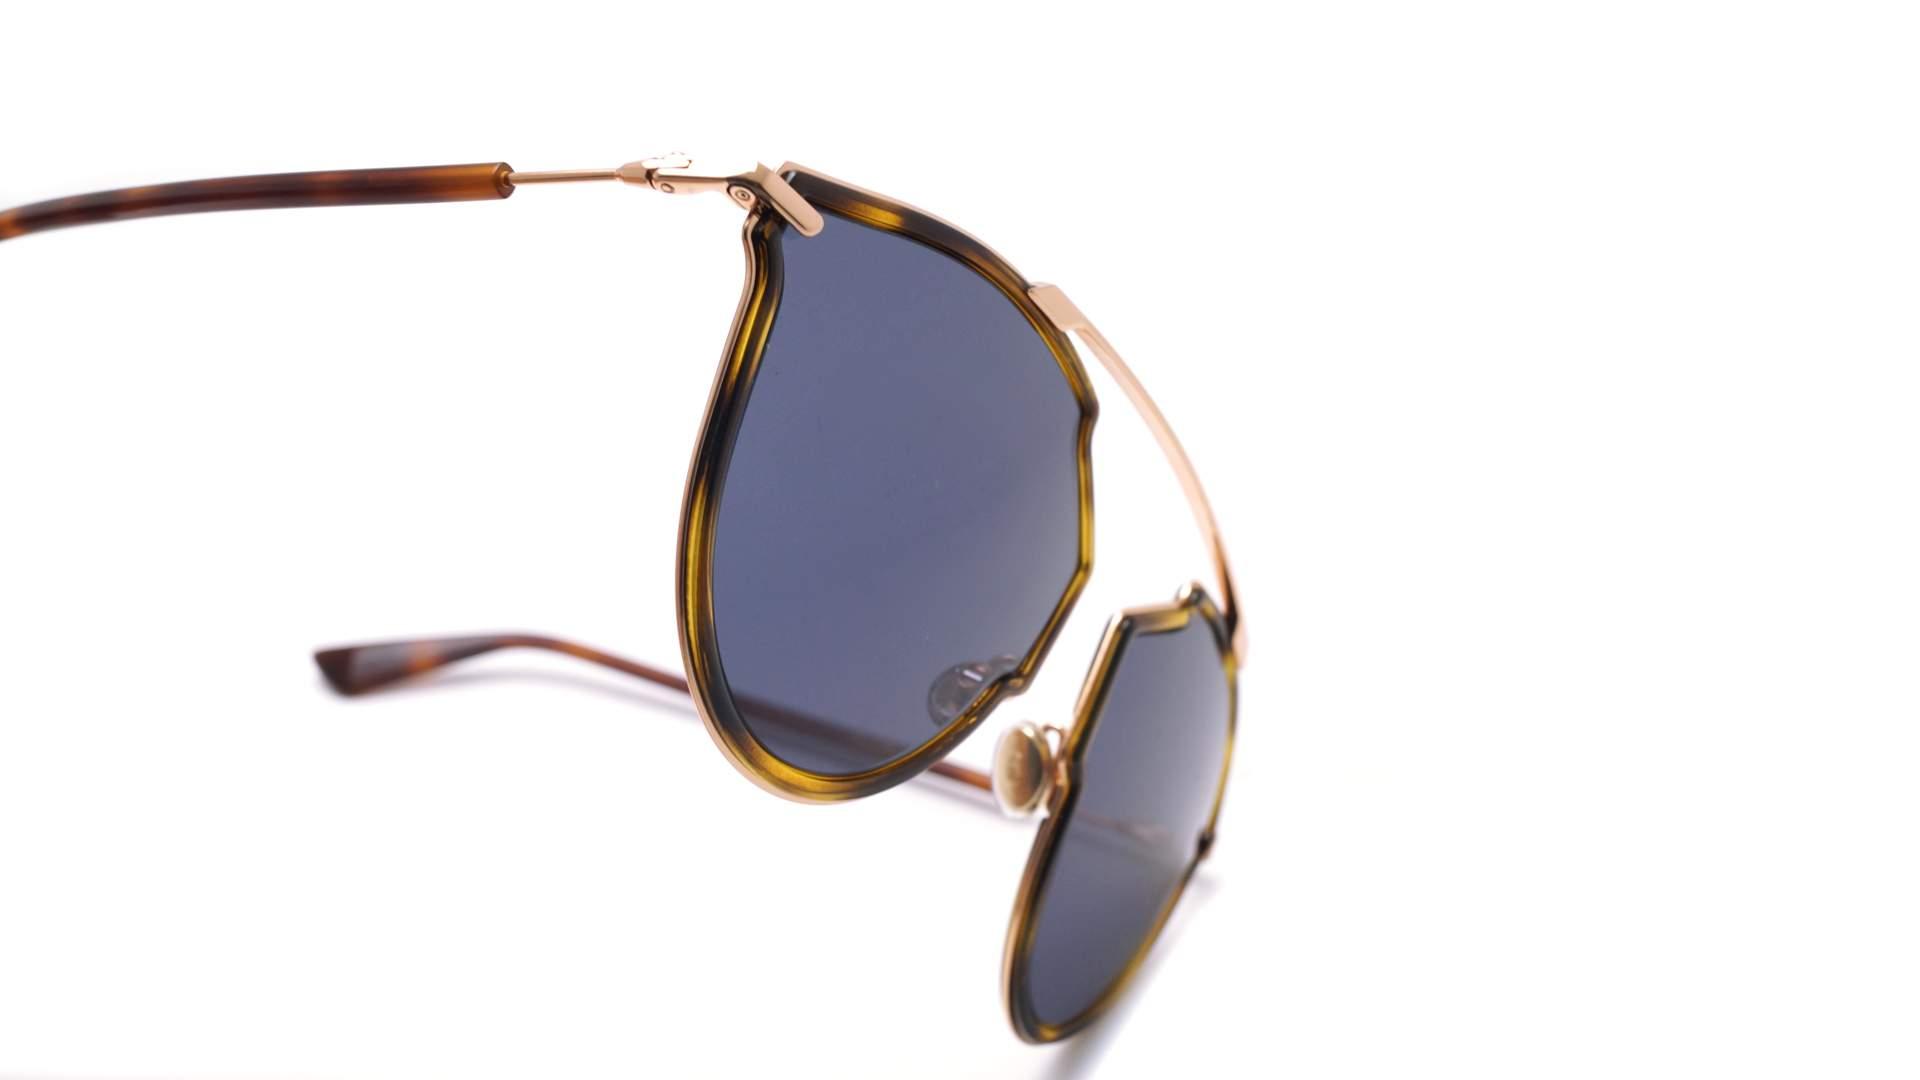 378d5766fd Sunglasses Dior SoReal Rise Tortoise DIORSOREALRISE QUMKU 58-17 Large